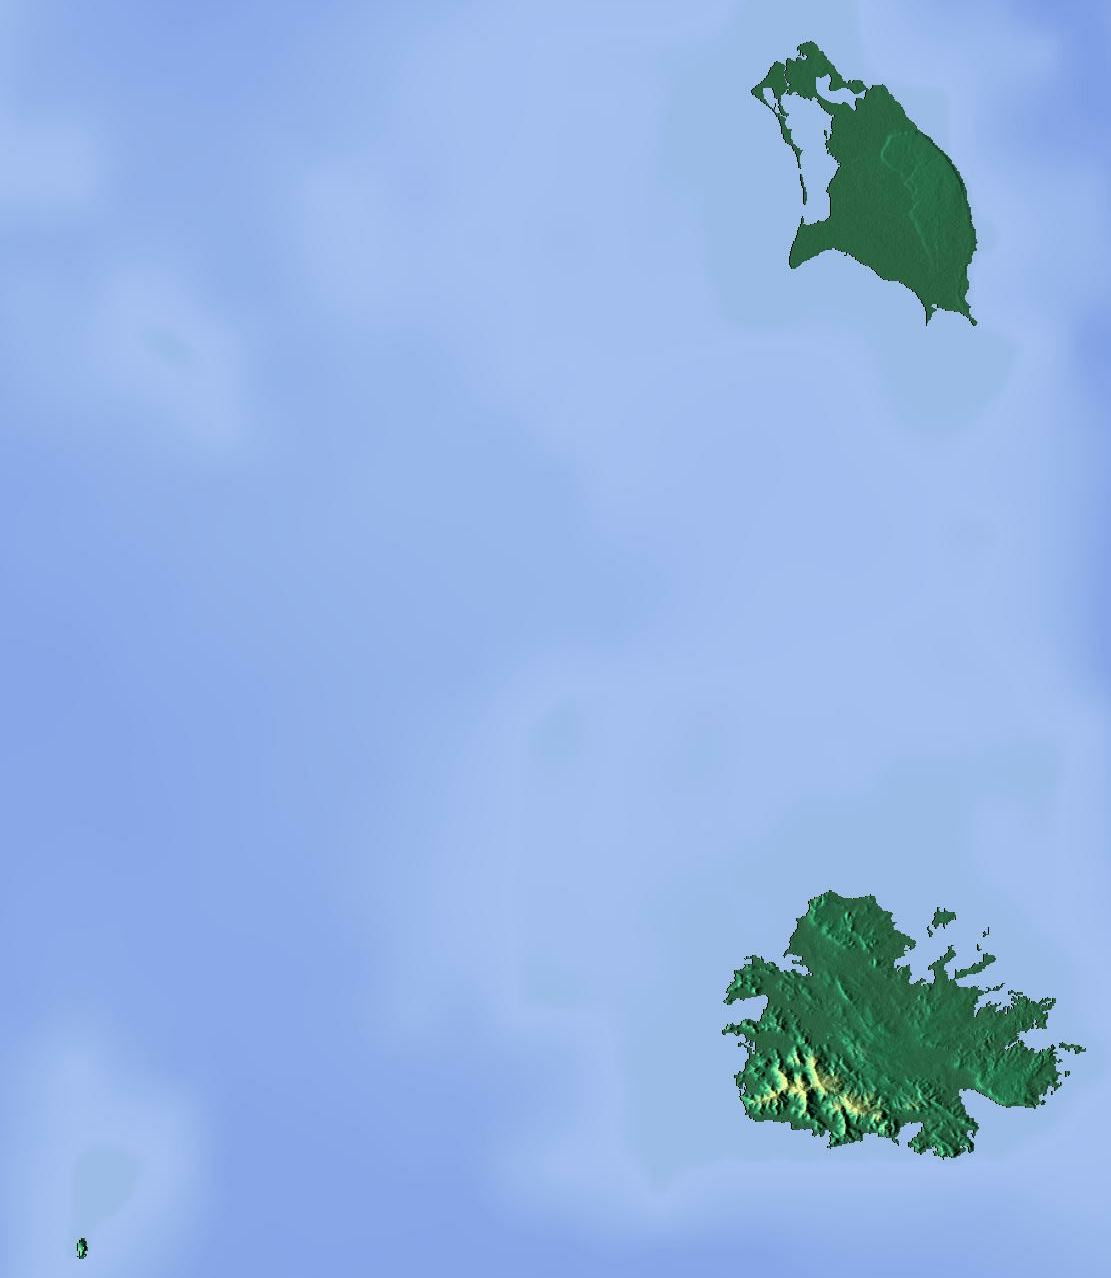 Mapa topograficzna Antigui i Barbudy